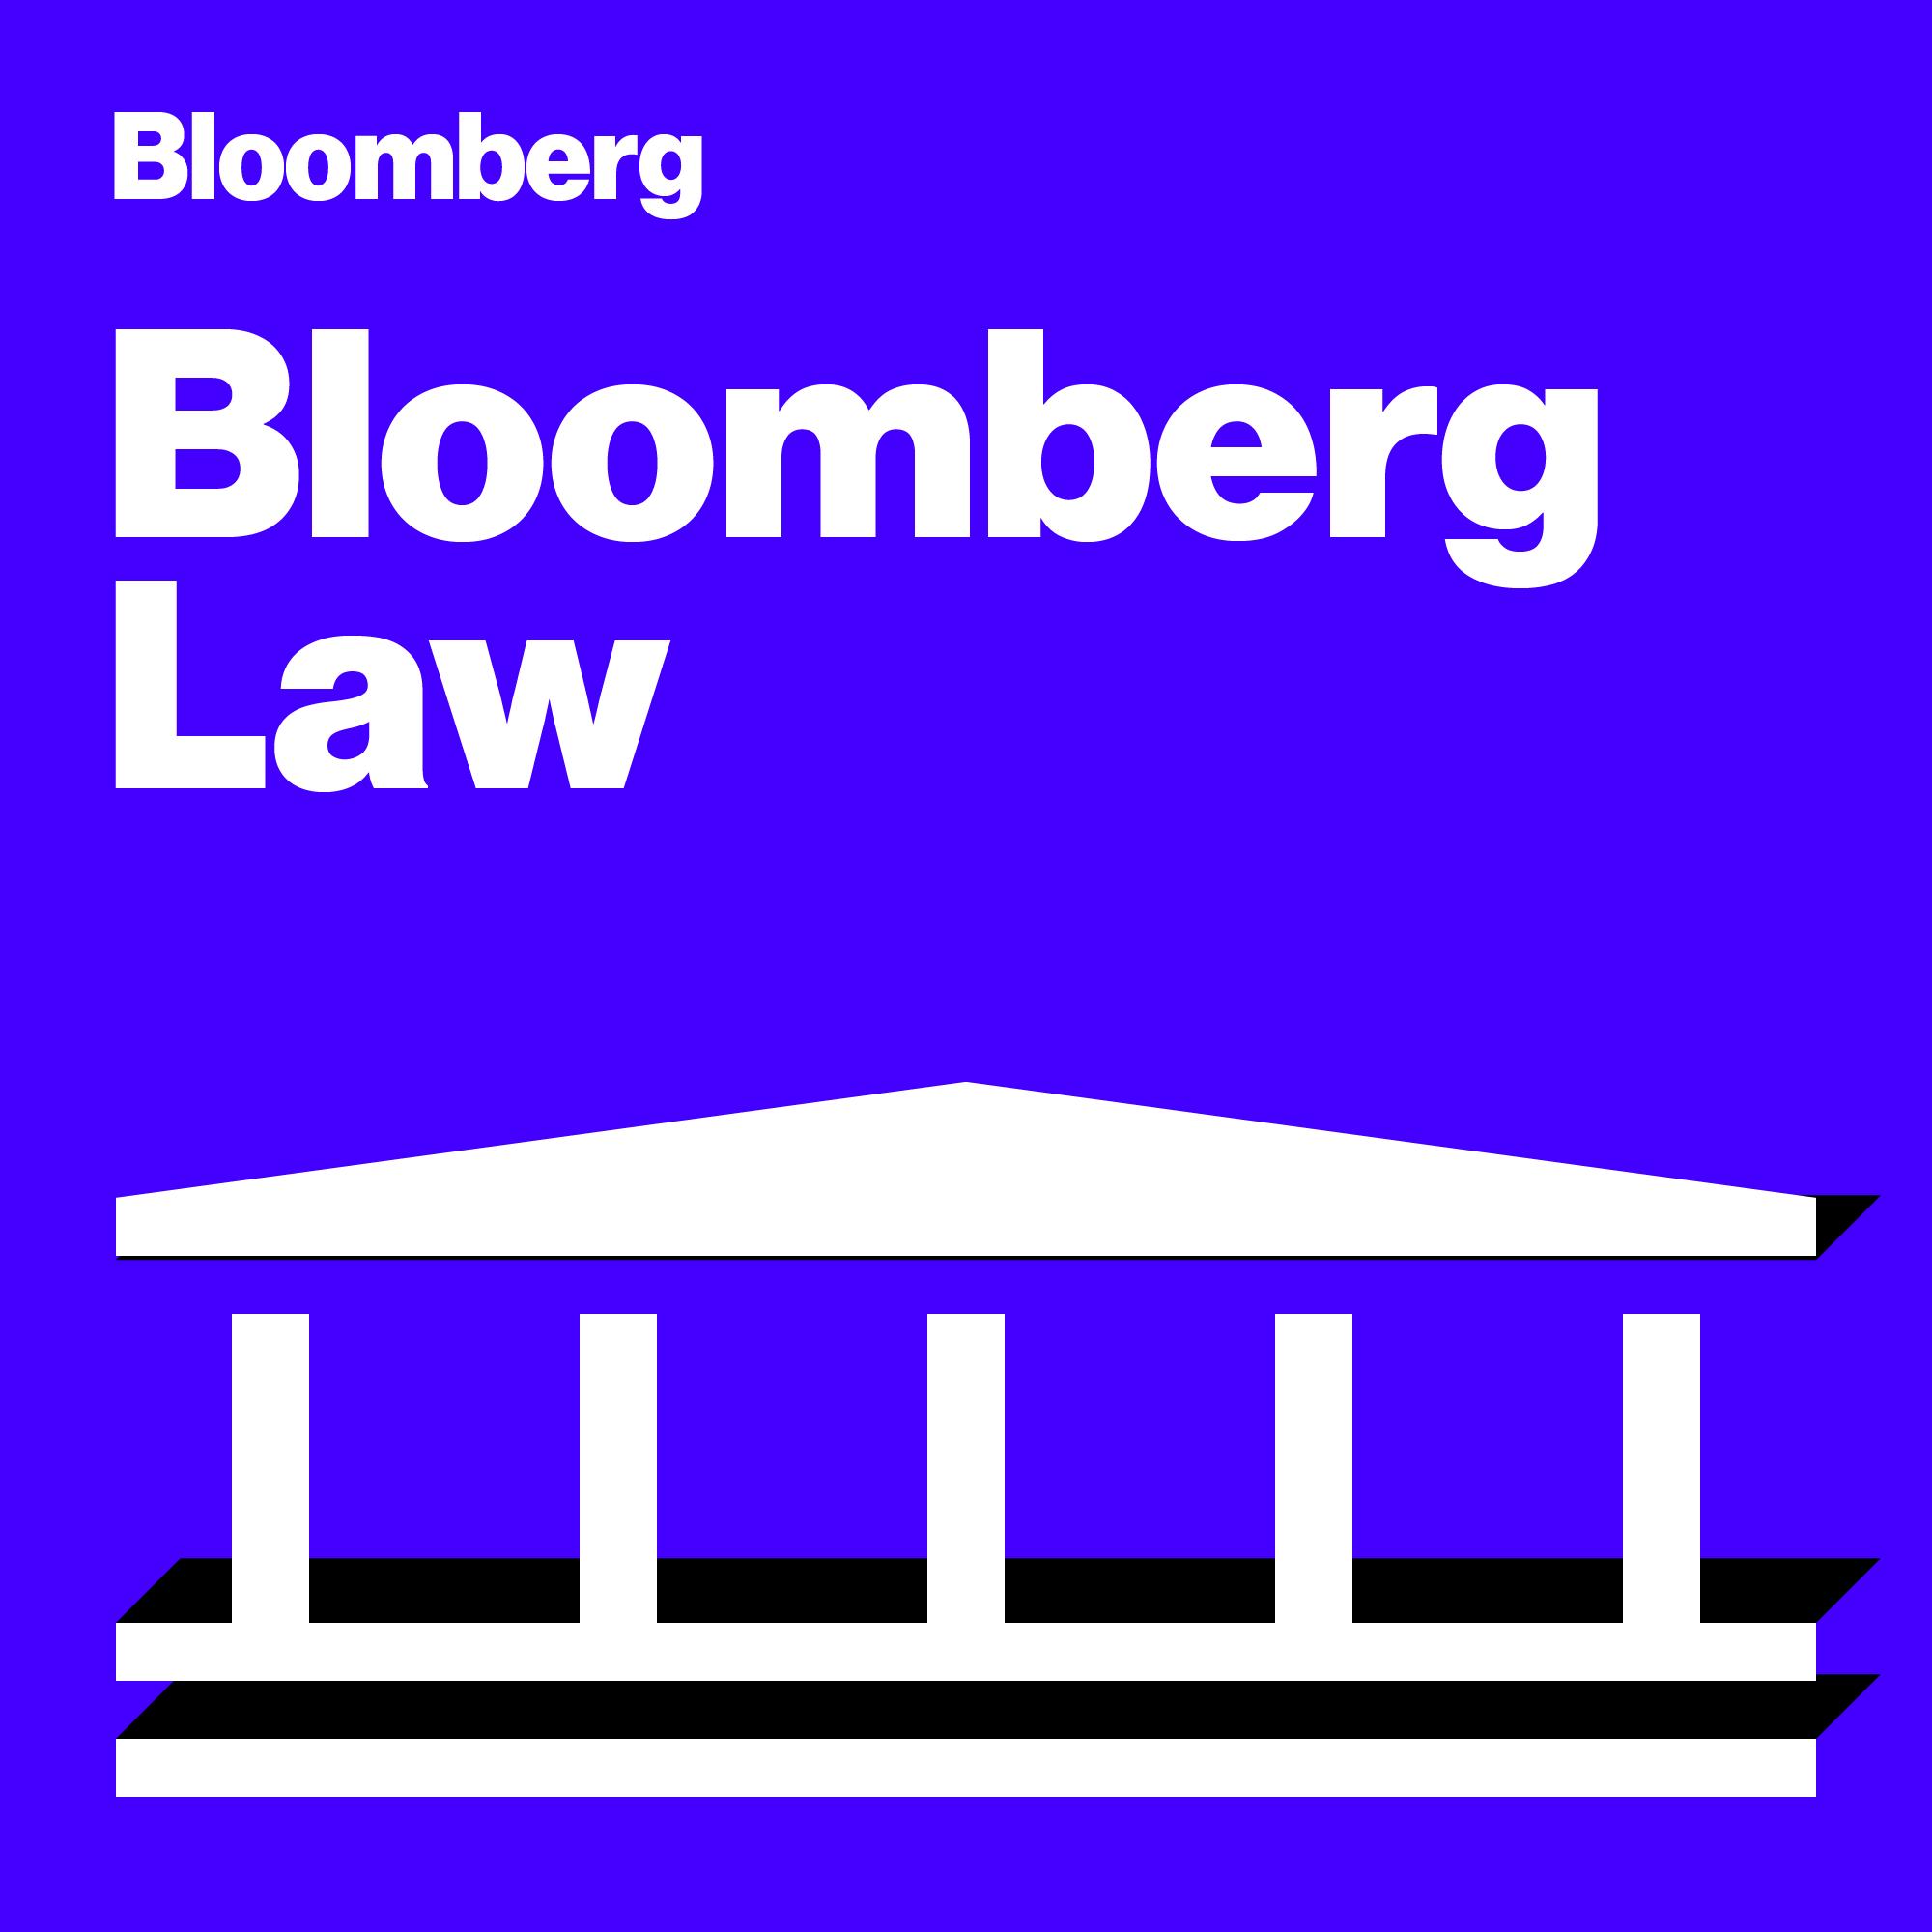 Bloomberg Law